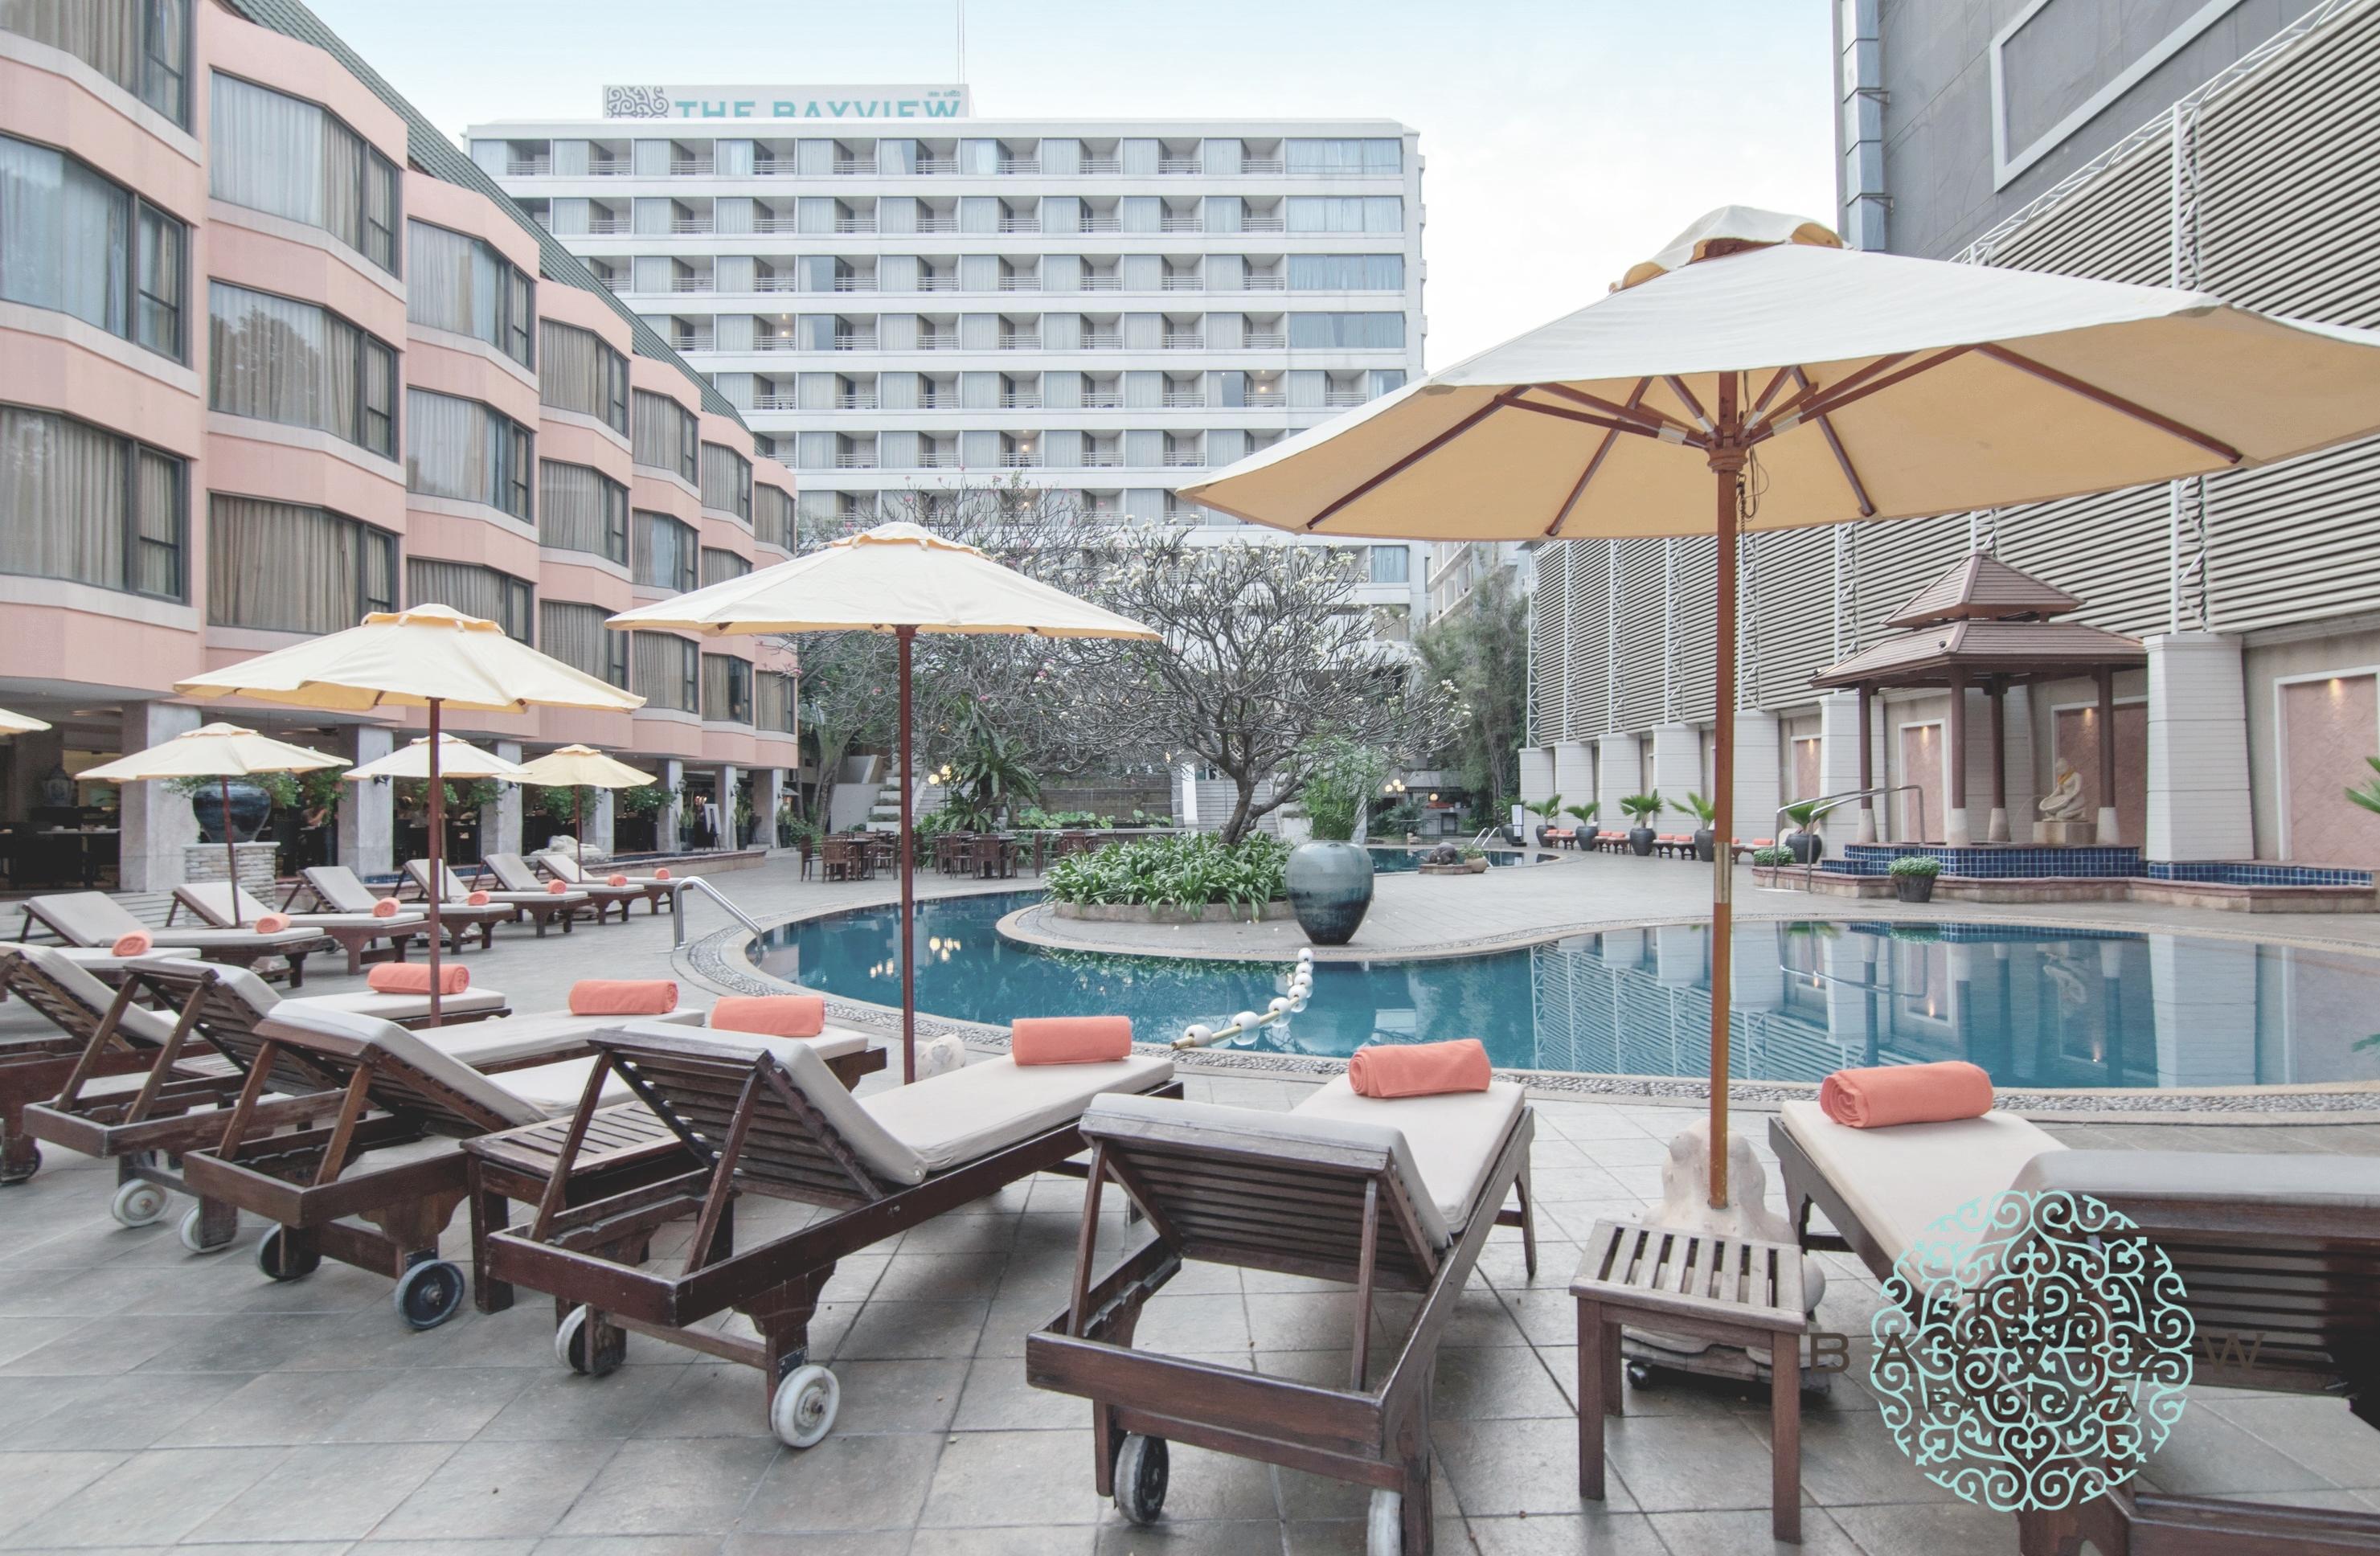 LK The Empress Pattaya, Pattaya